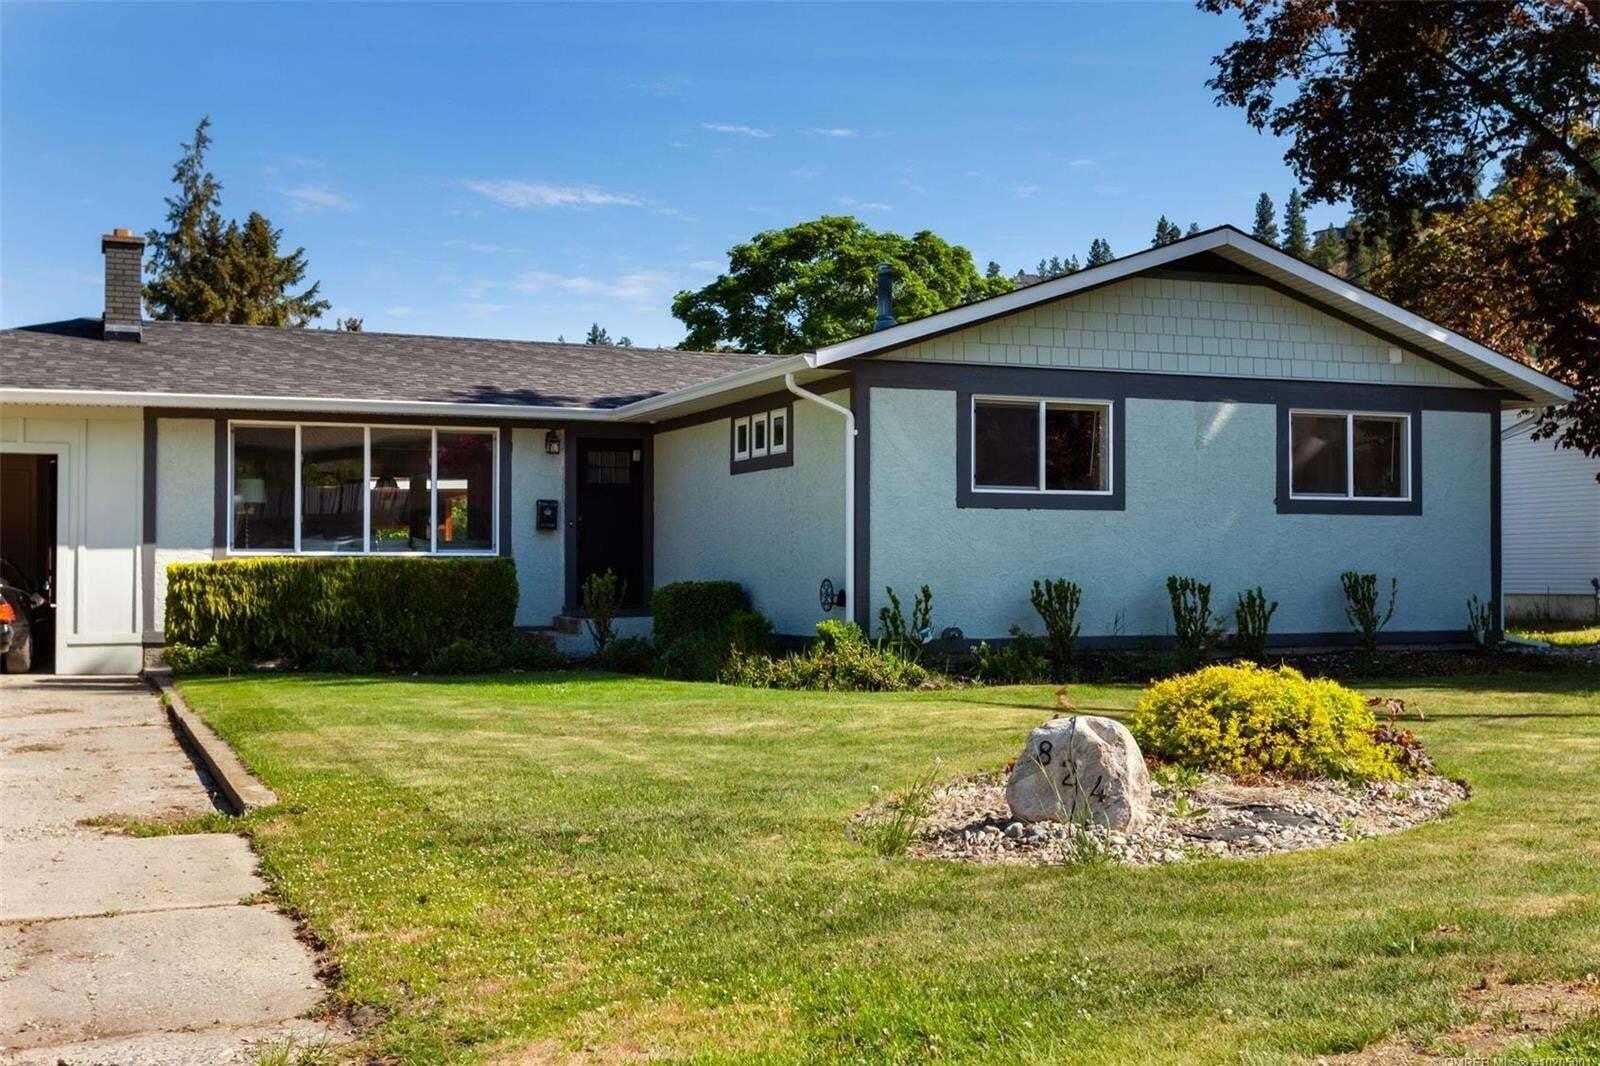 House for sale at 824 Hubbard Rd Kelowna British Columbia - MLS: 10205001